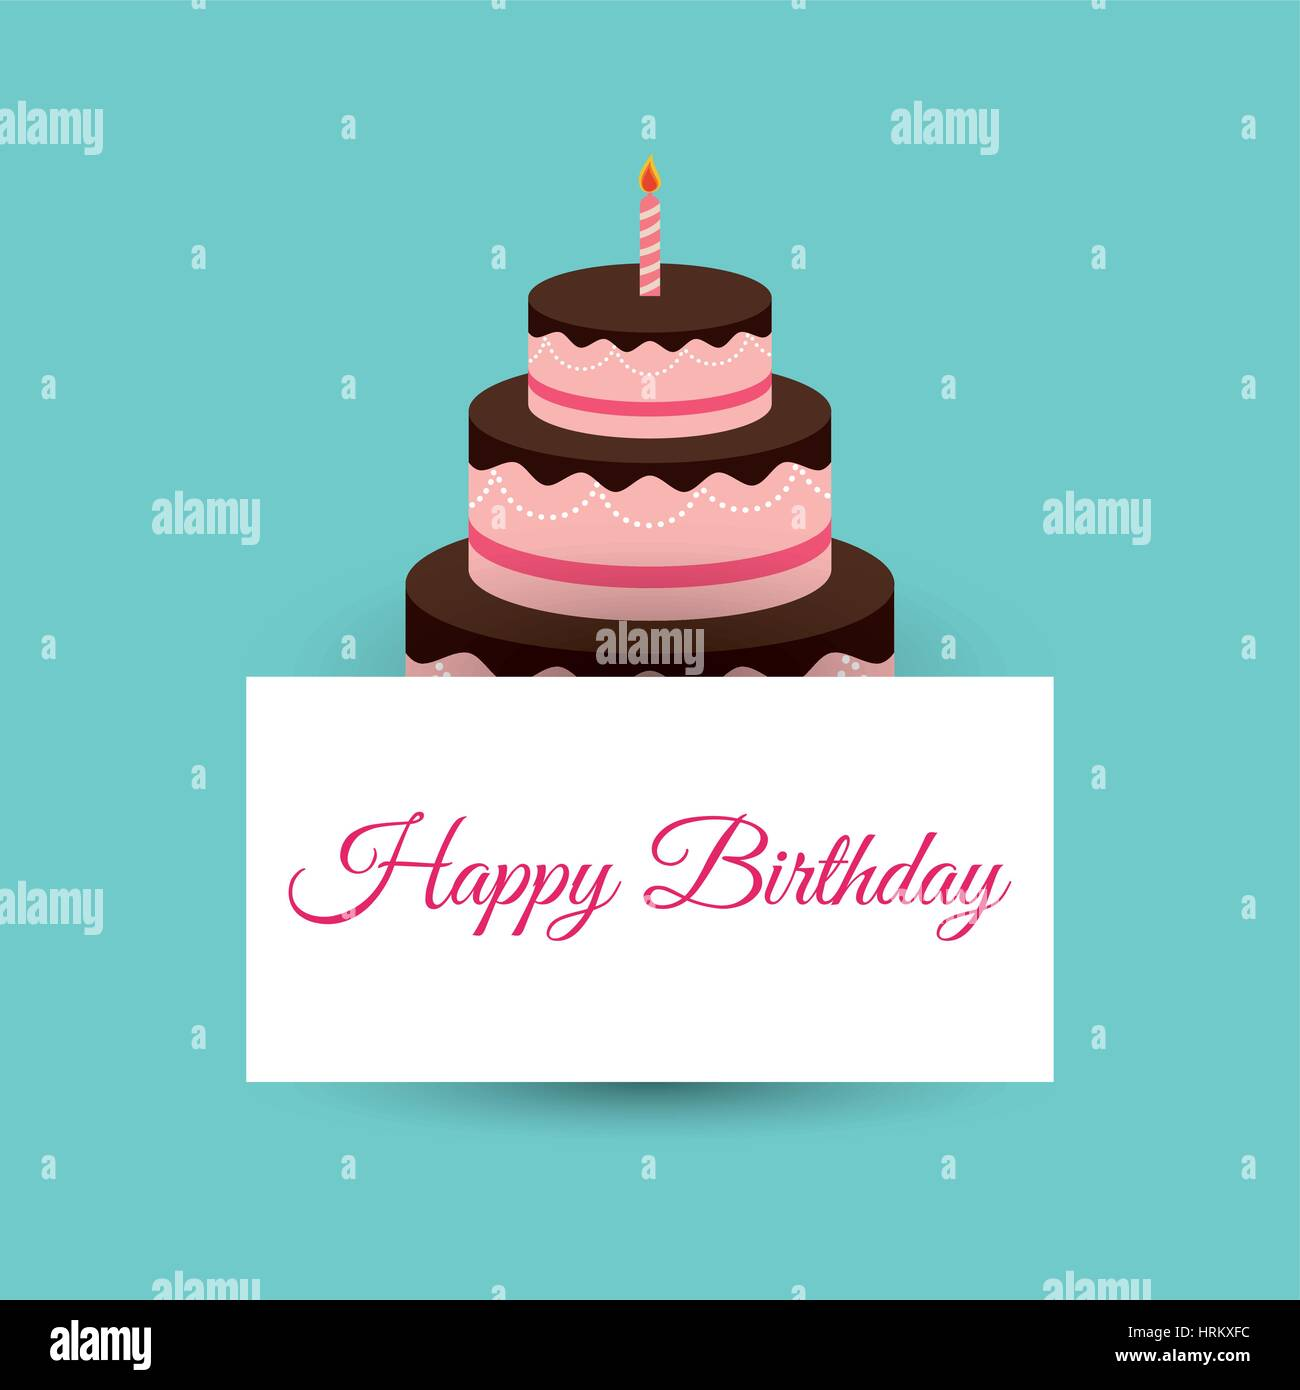 happy birthday cake card party event Vector Art – Happy Birthday Cake Greetings